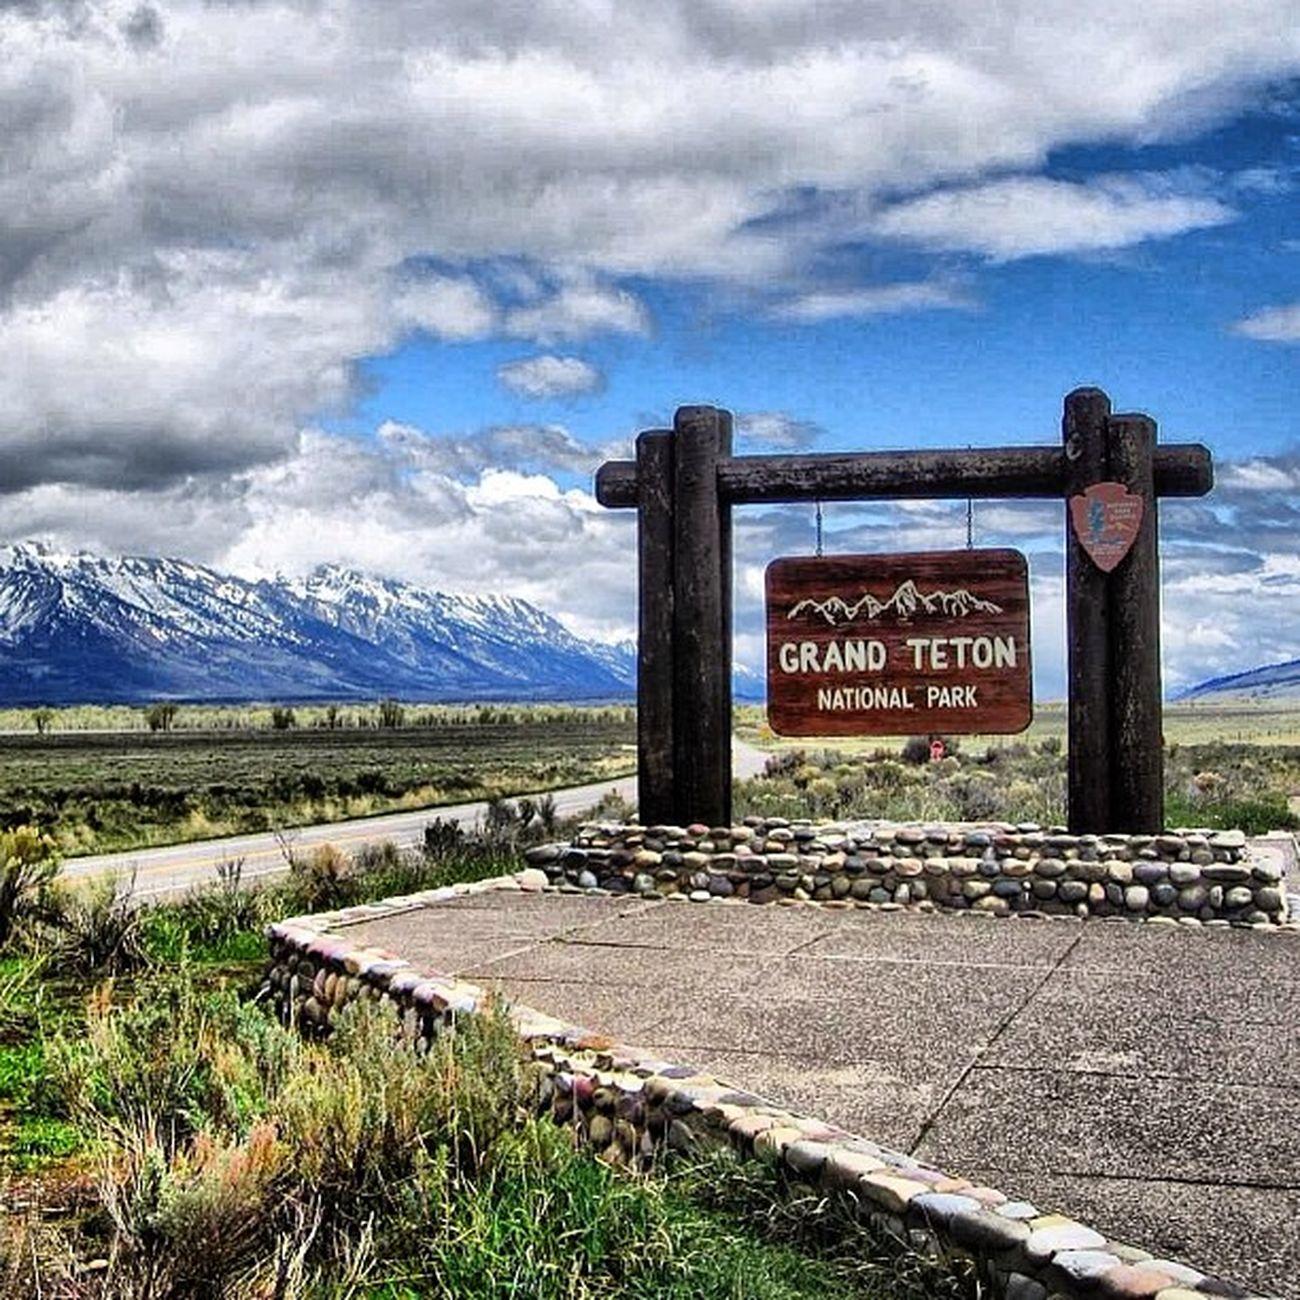 Grand Teton National Park #grandteton #nationalpark #nature #park #outdoors #wyoming #clouds #travel #honktravel Clouds Nature Travel Outdoors Park Wyoming Nationalpark Honktravel Grandteton